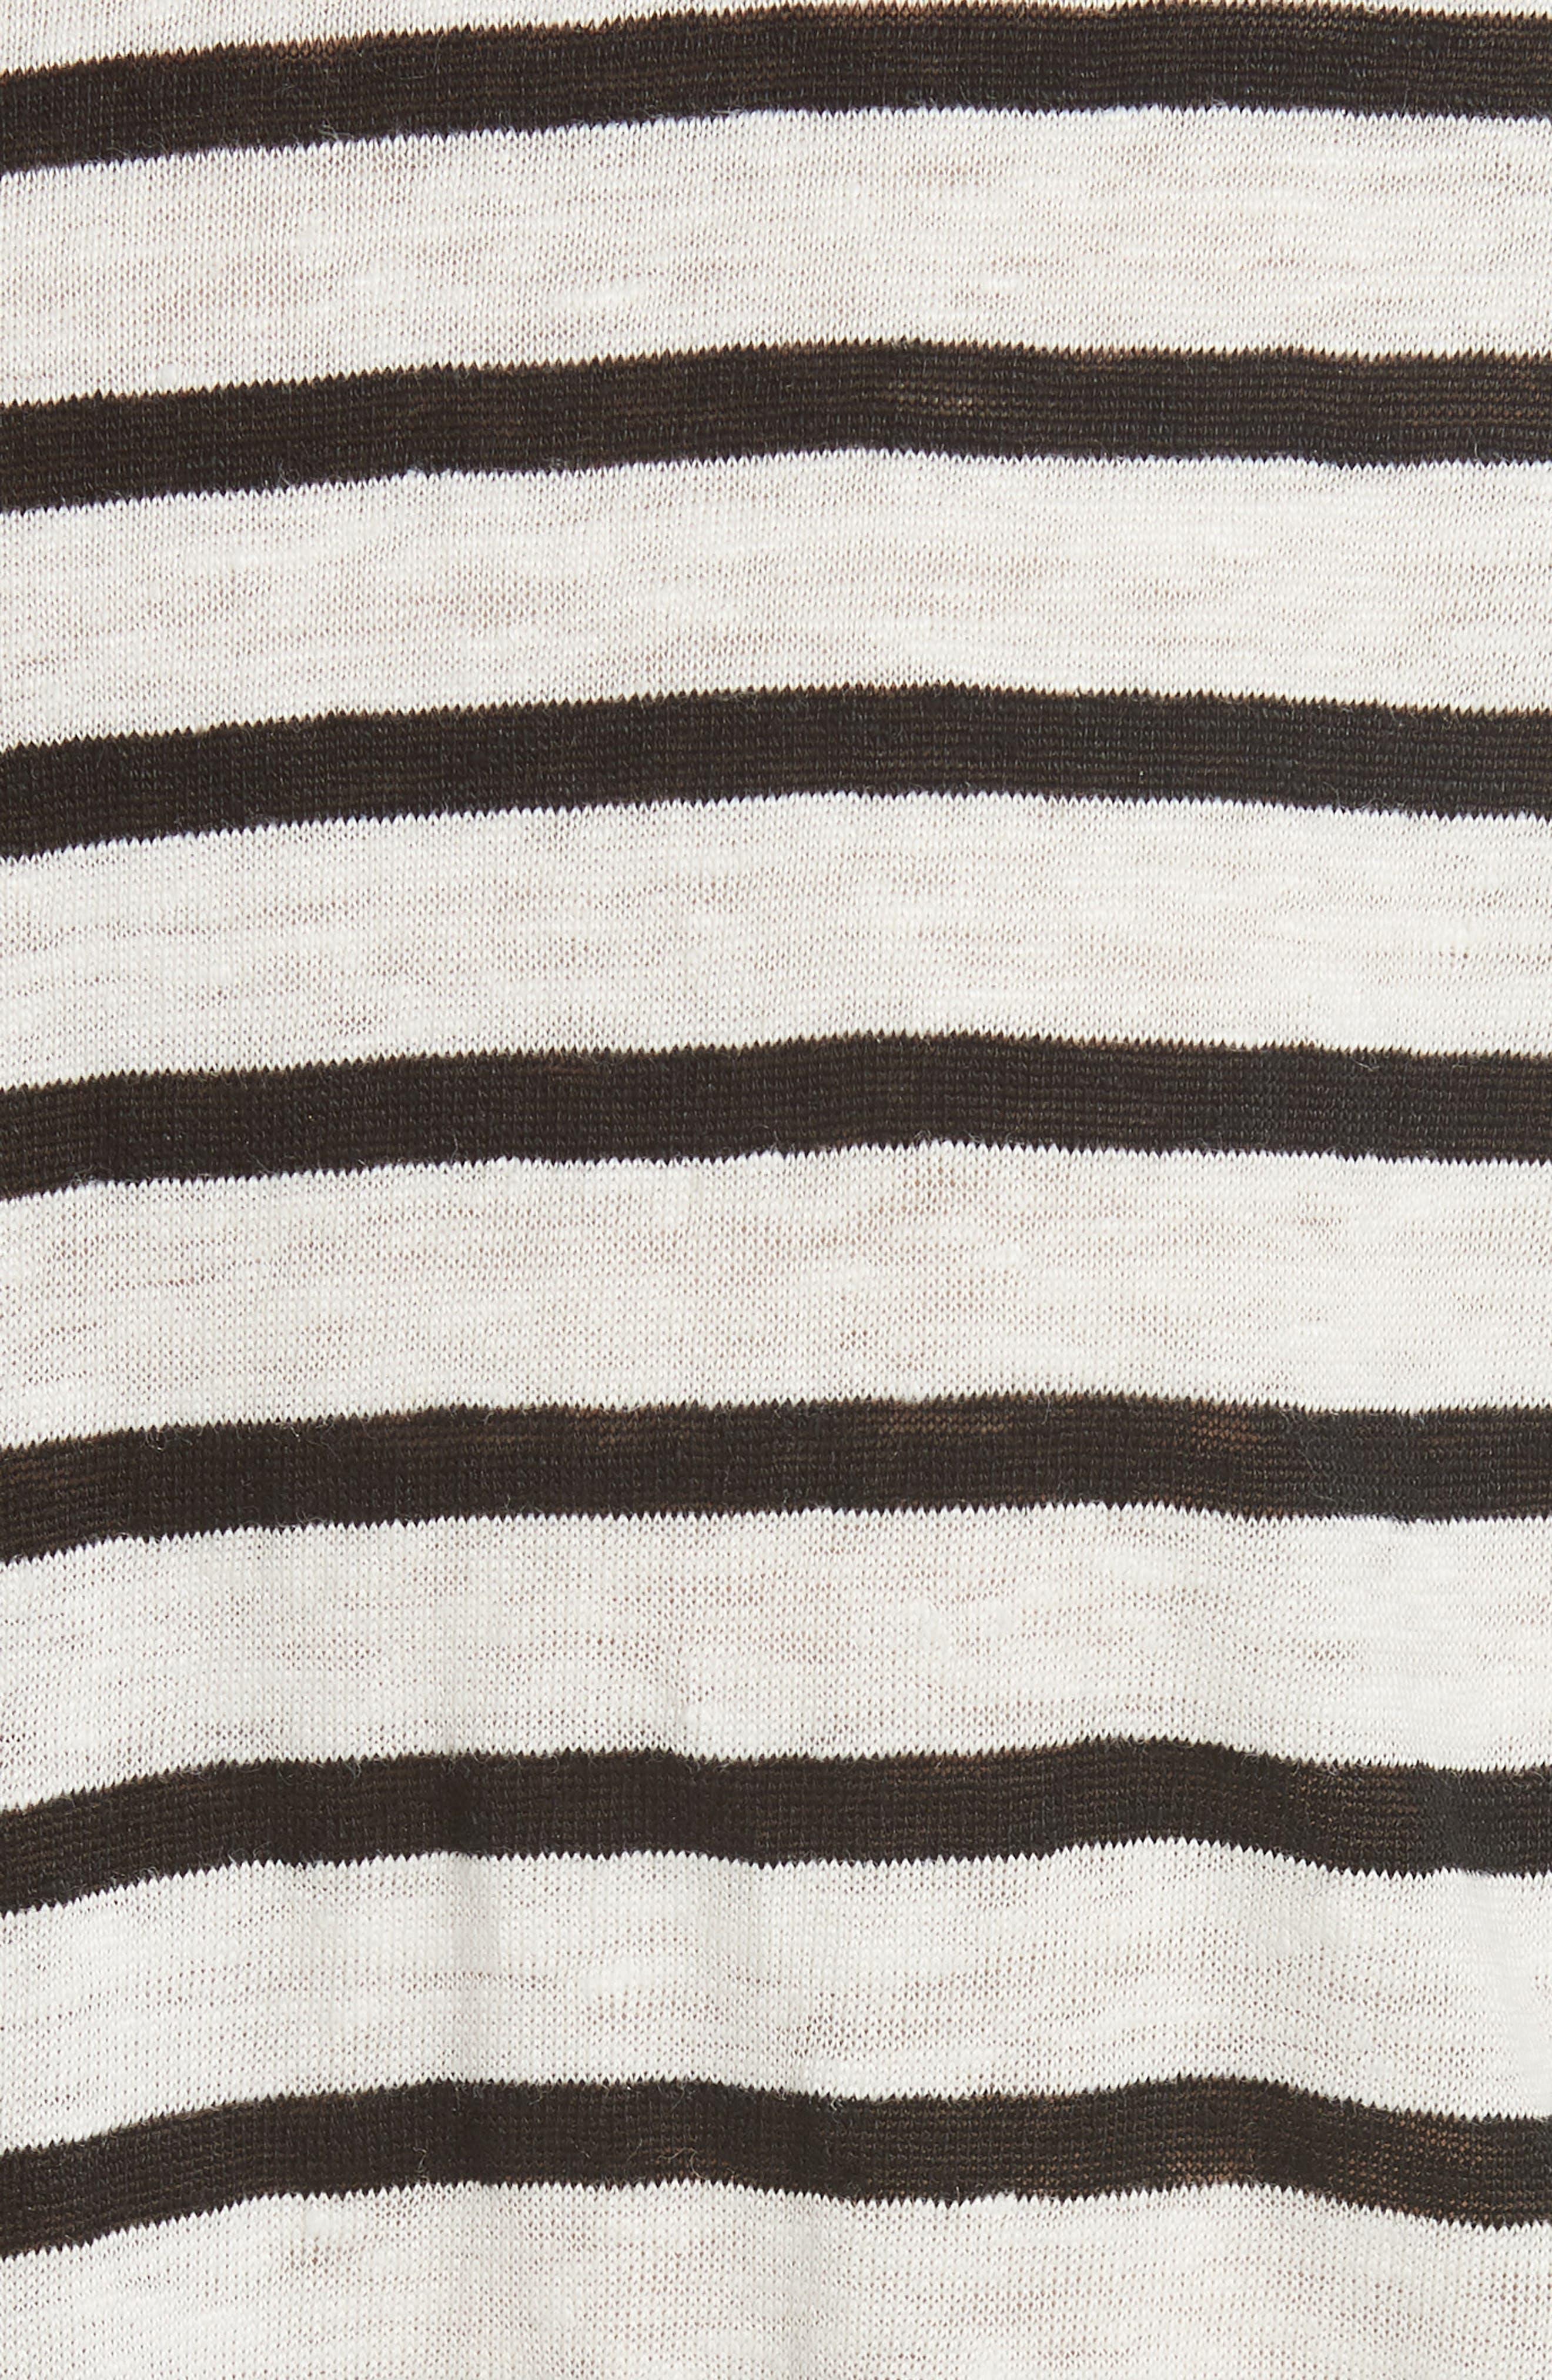 Dolman Sleeve Linen Tee,                             Alternate thumbnail 5, color,                             009